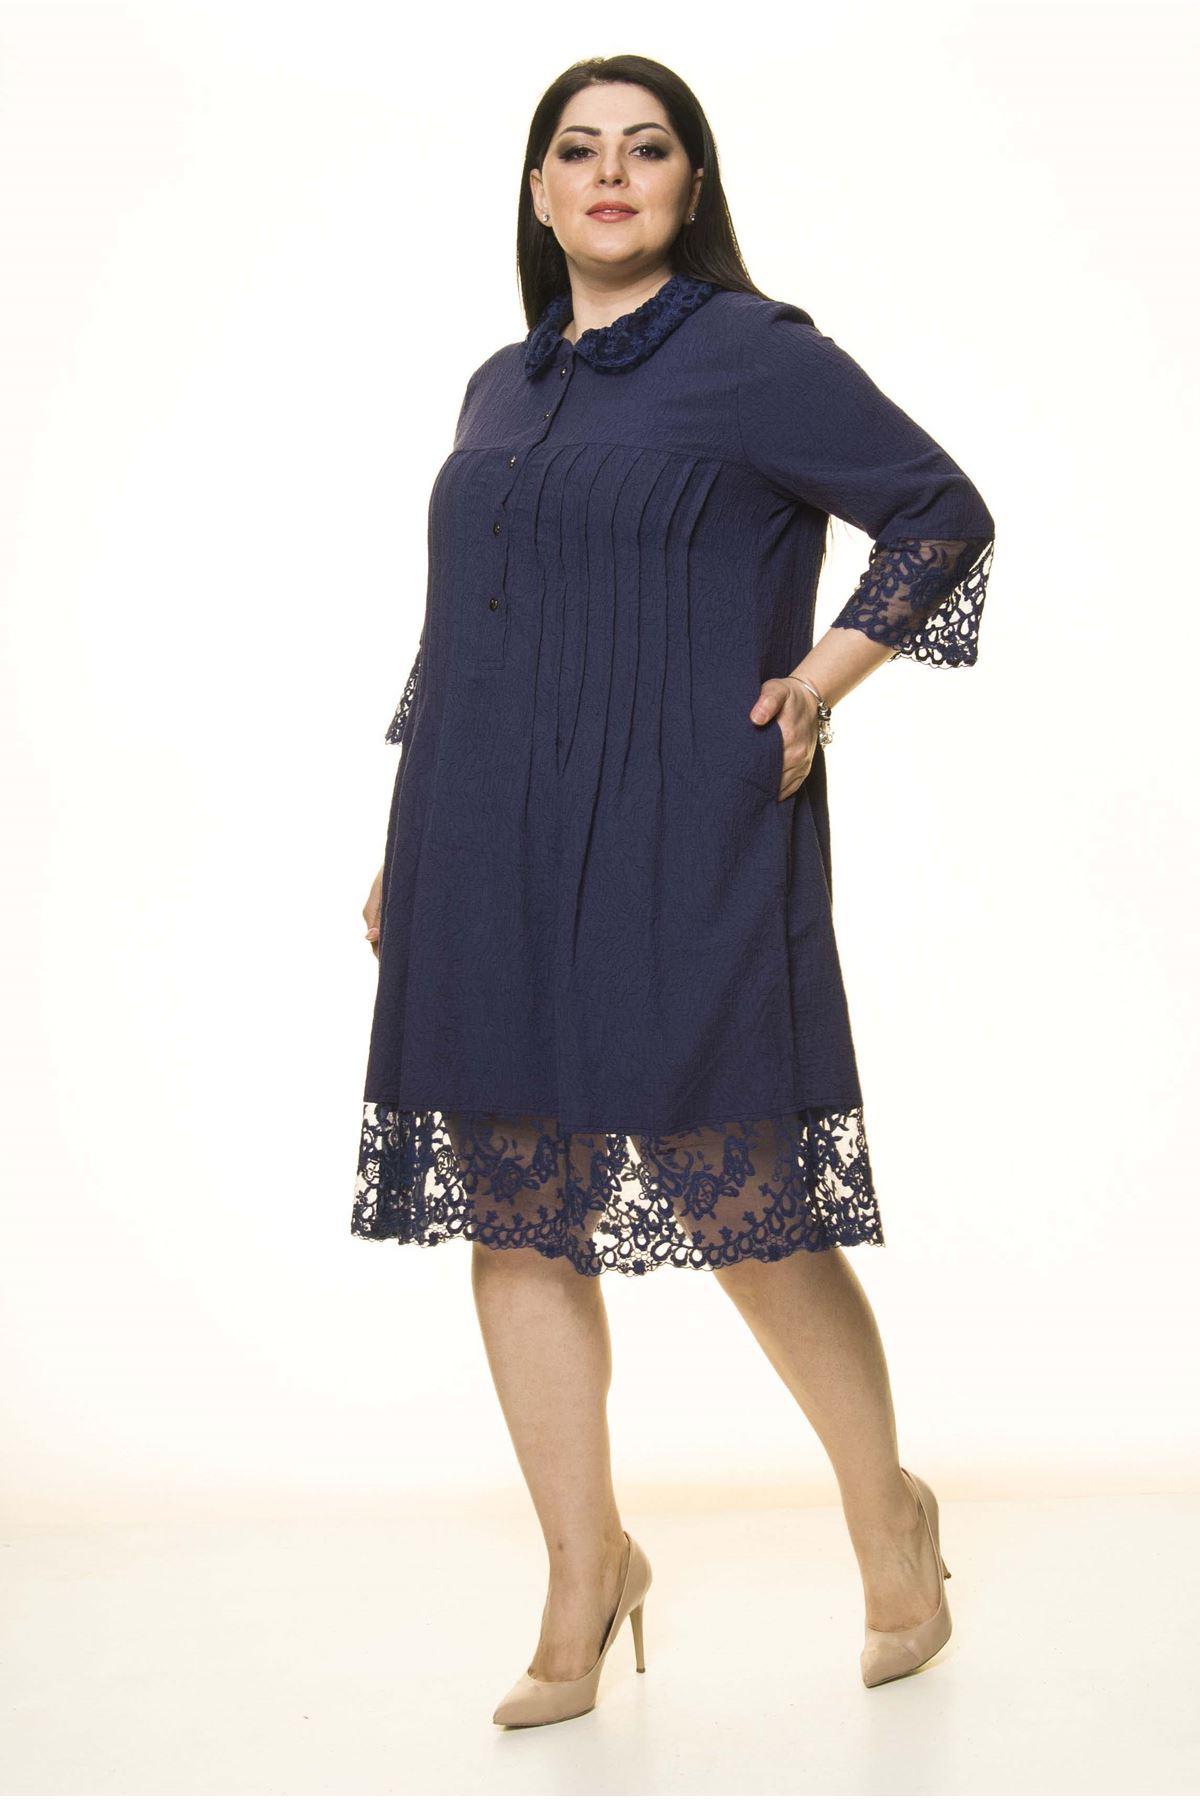 Lacivert Dantel Detaylı Elbise G10-1668